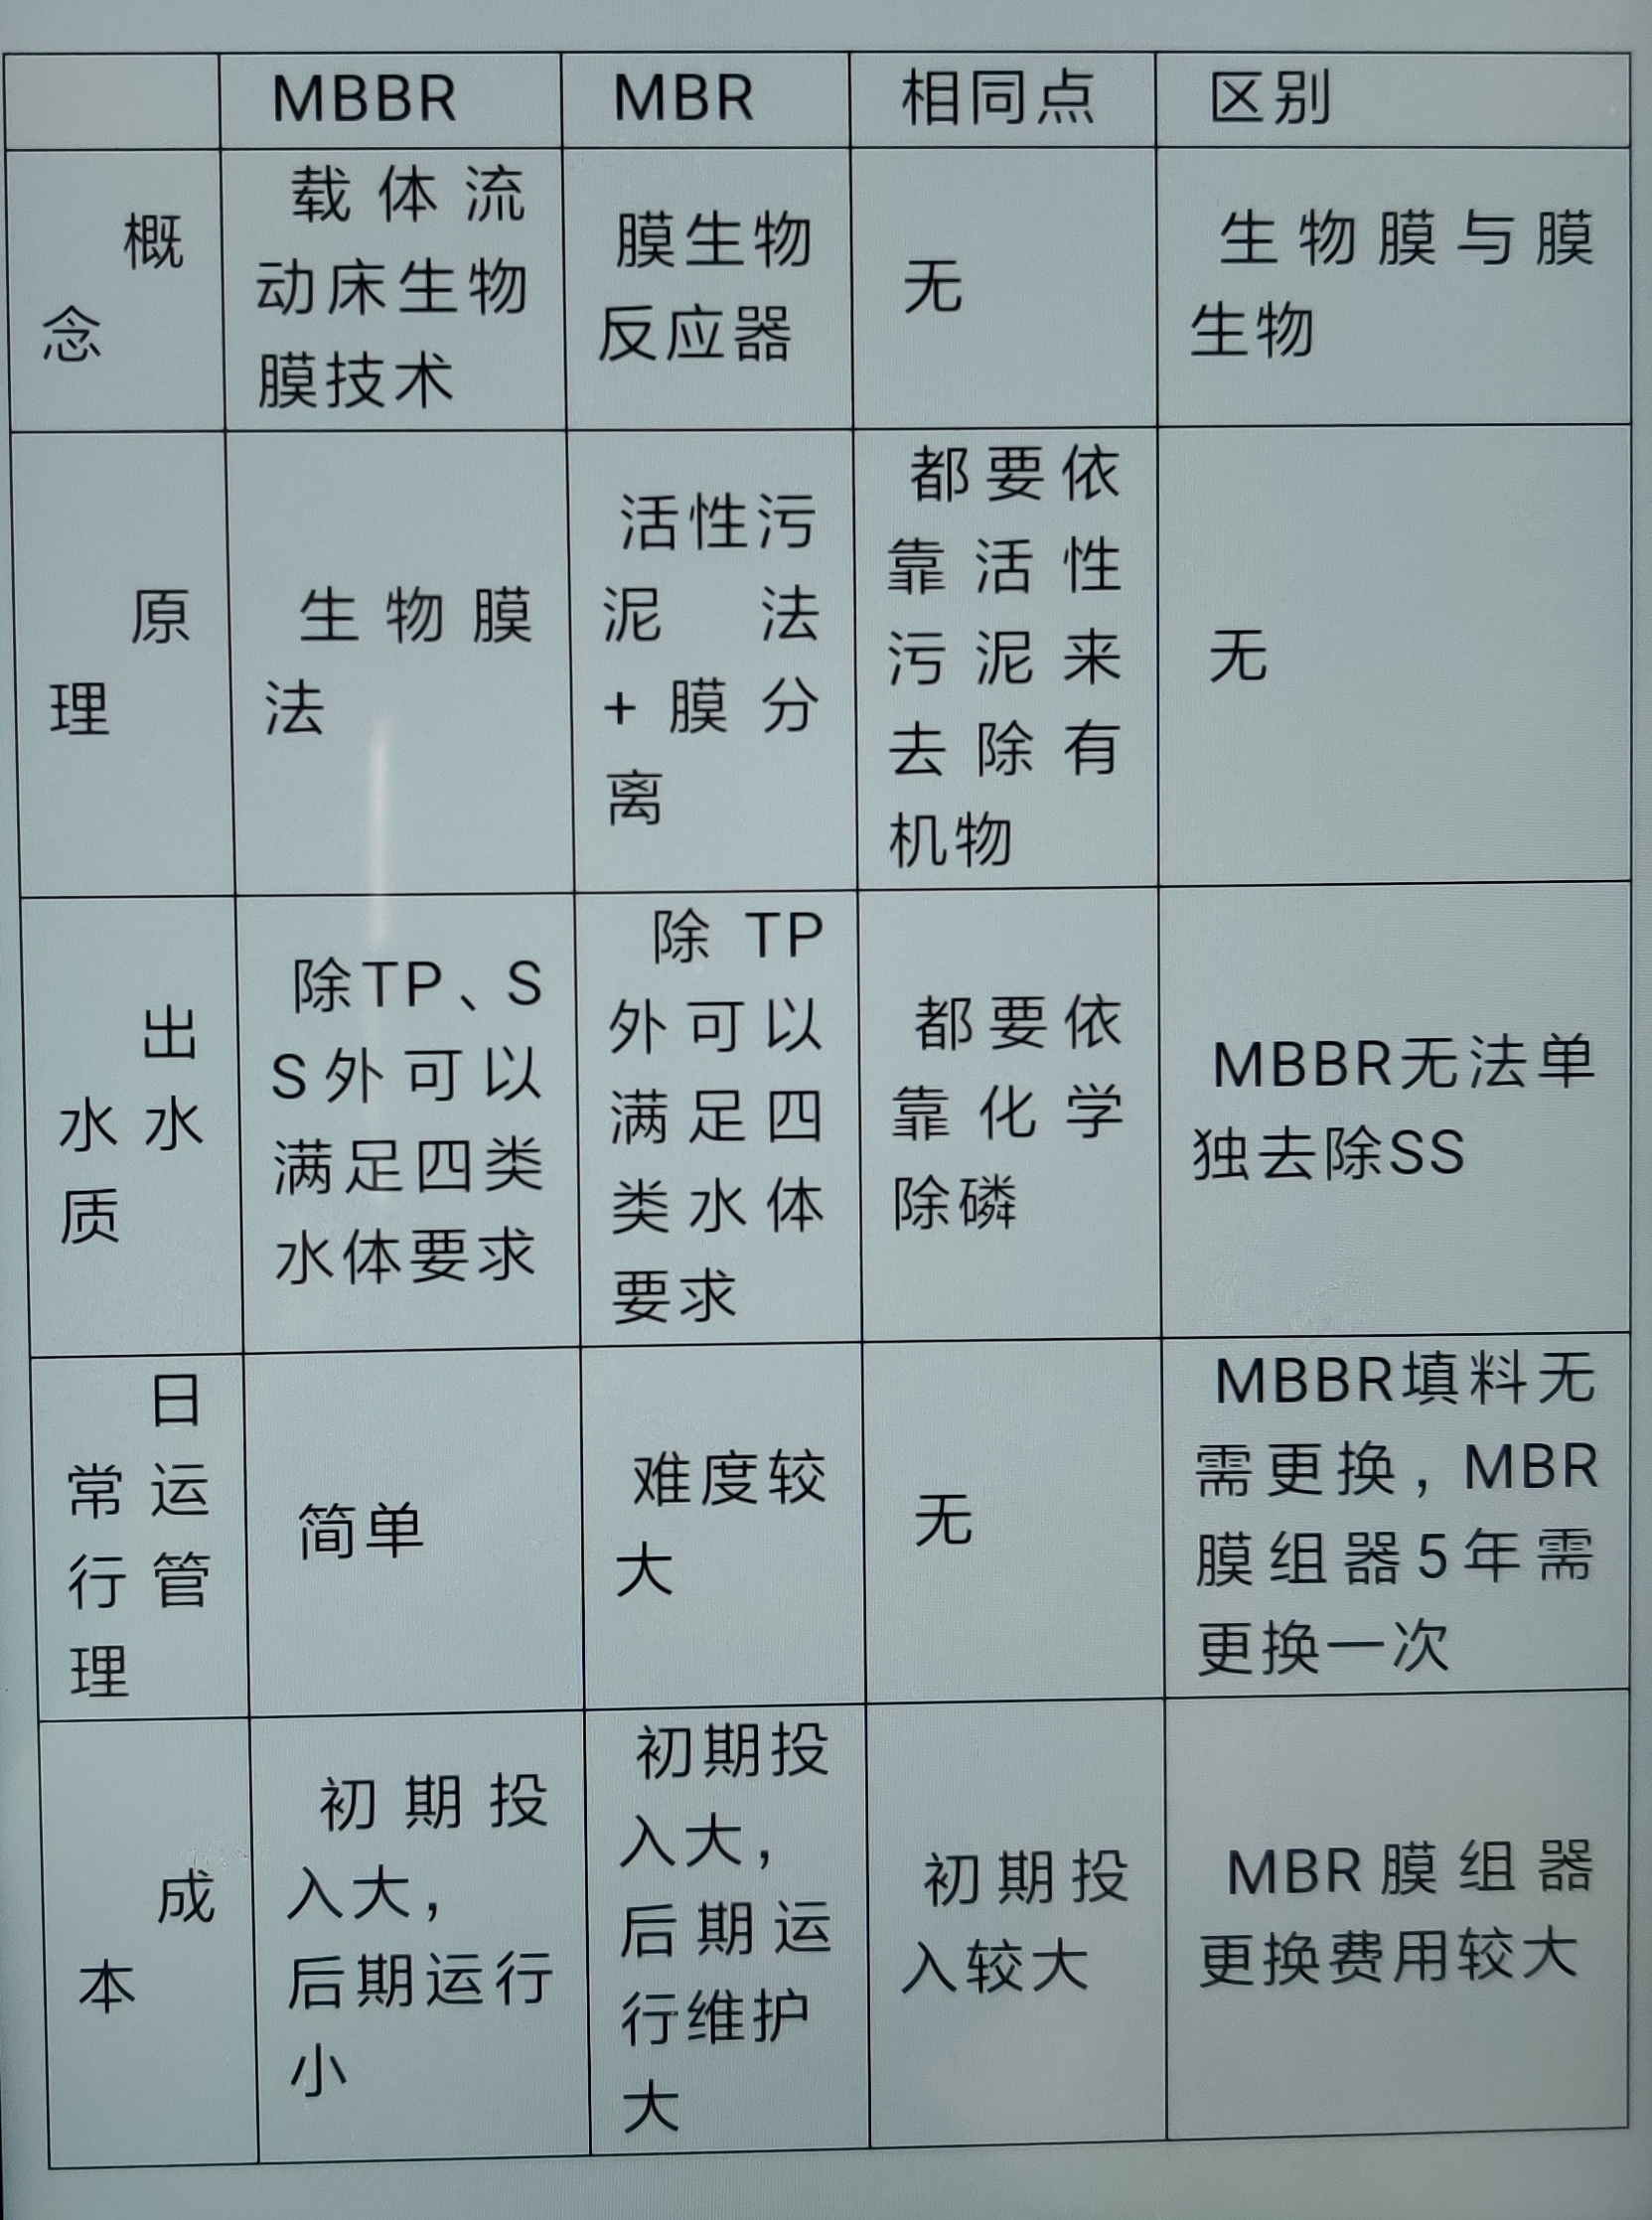 mbr工艺与mbbr工艺对照表